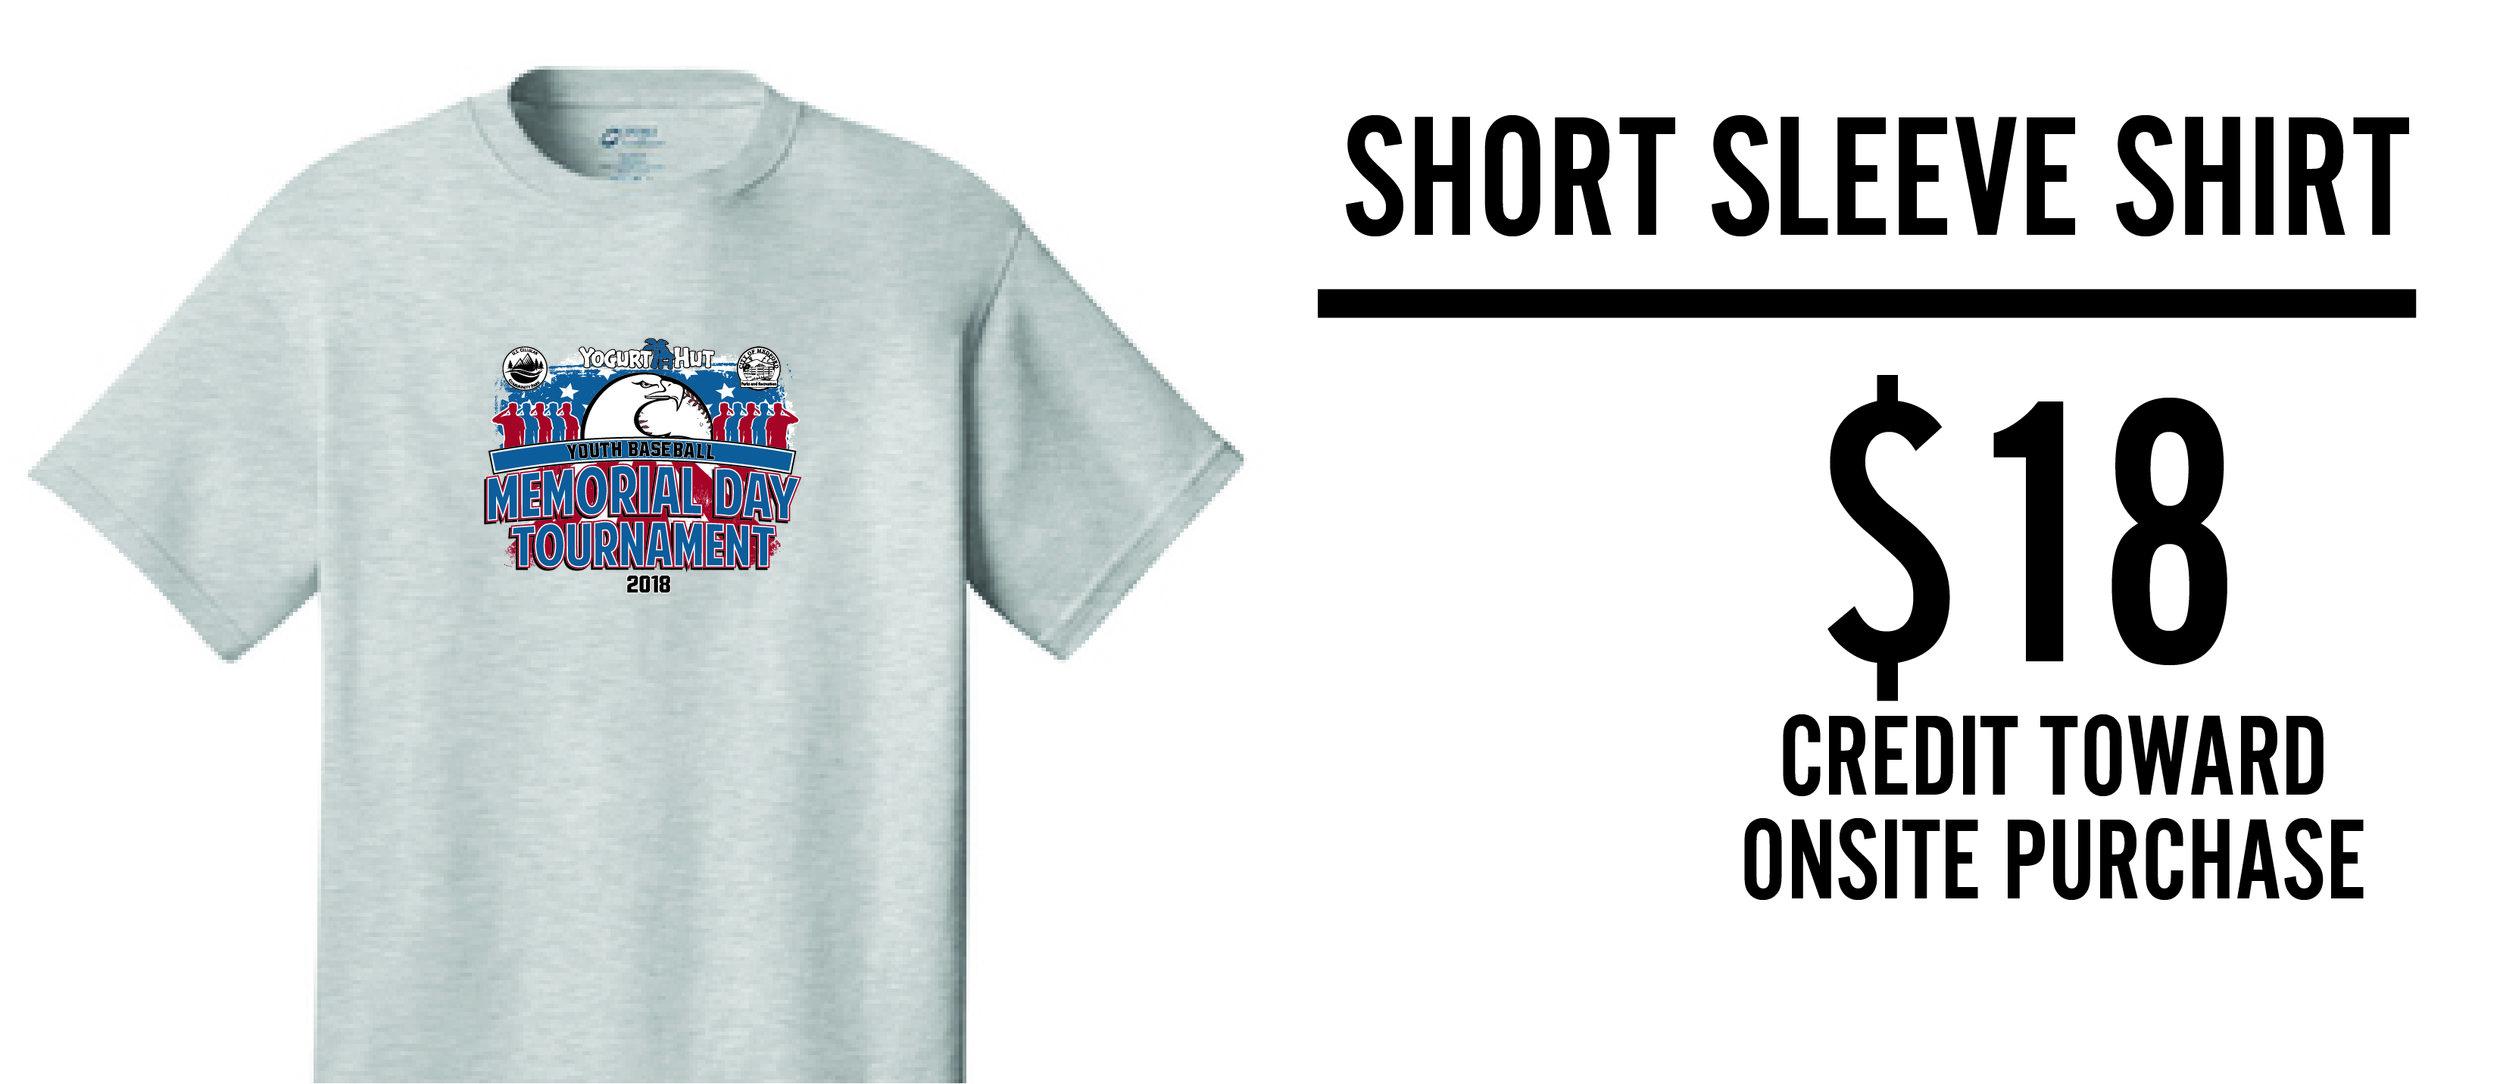 Cotton Short Sleeve.jpg